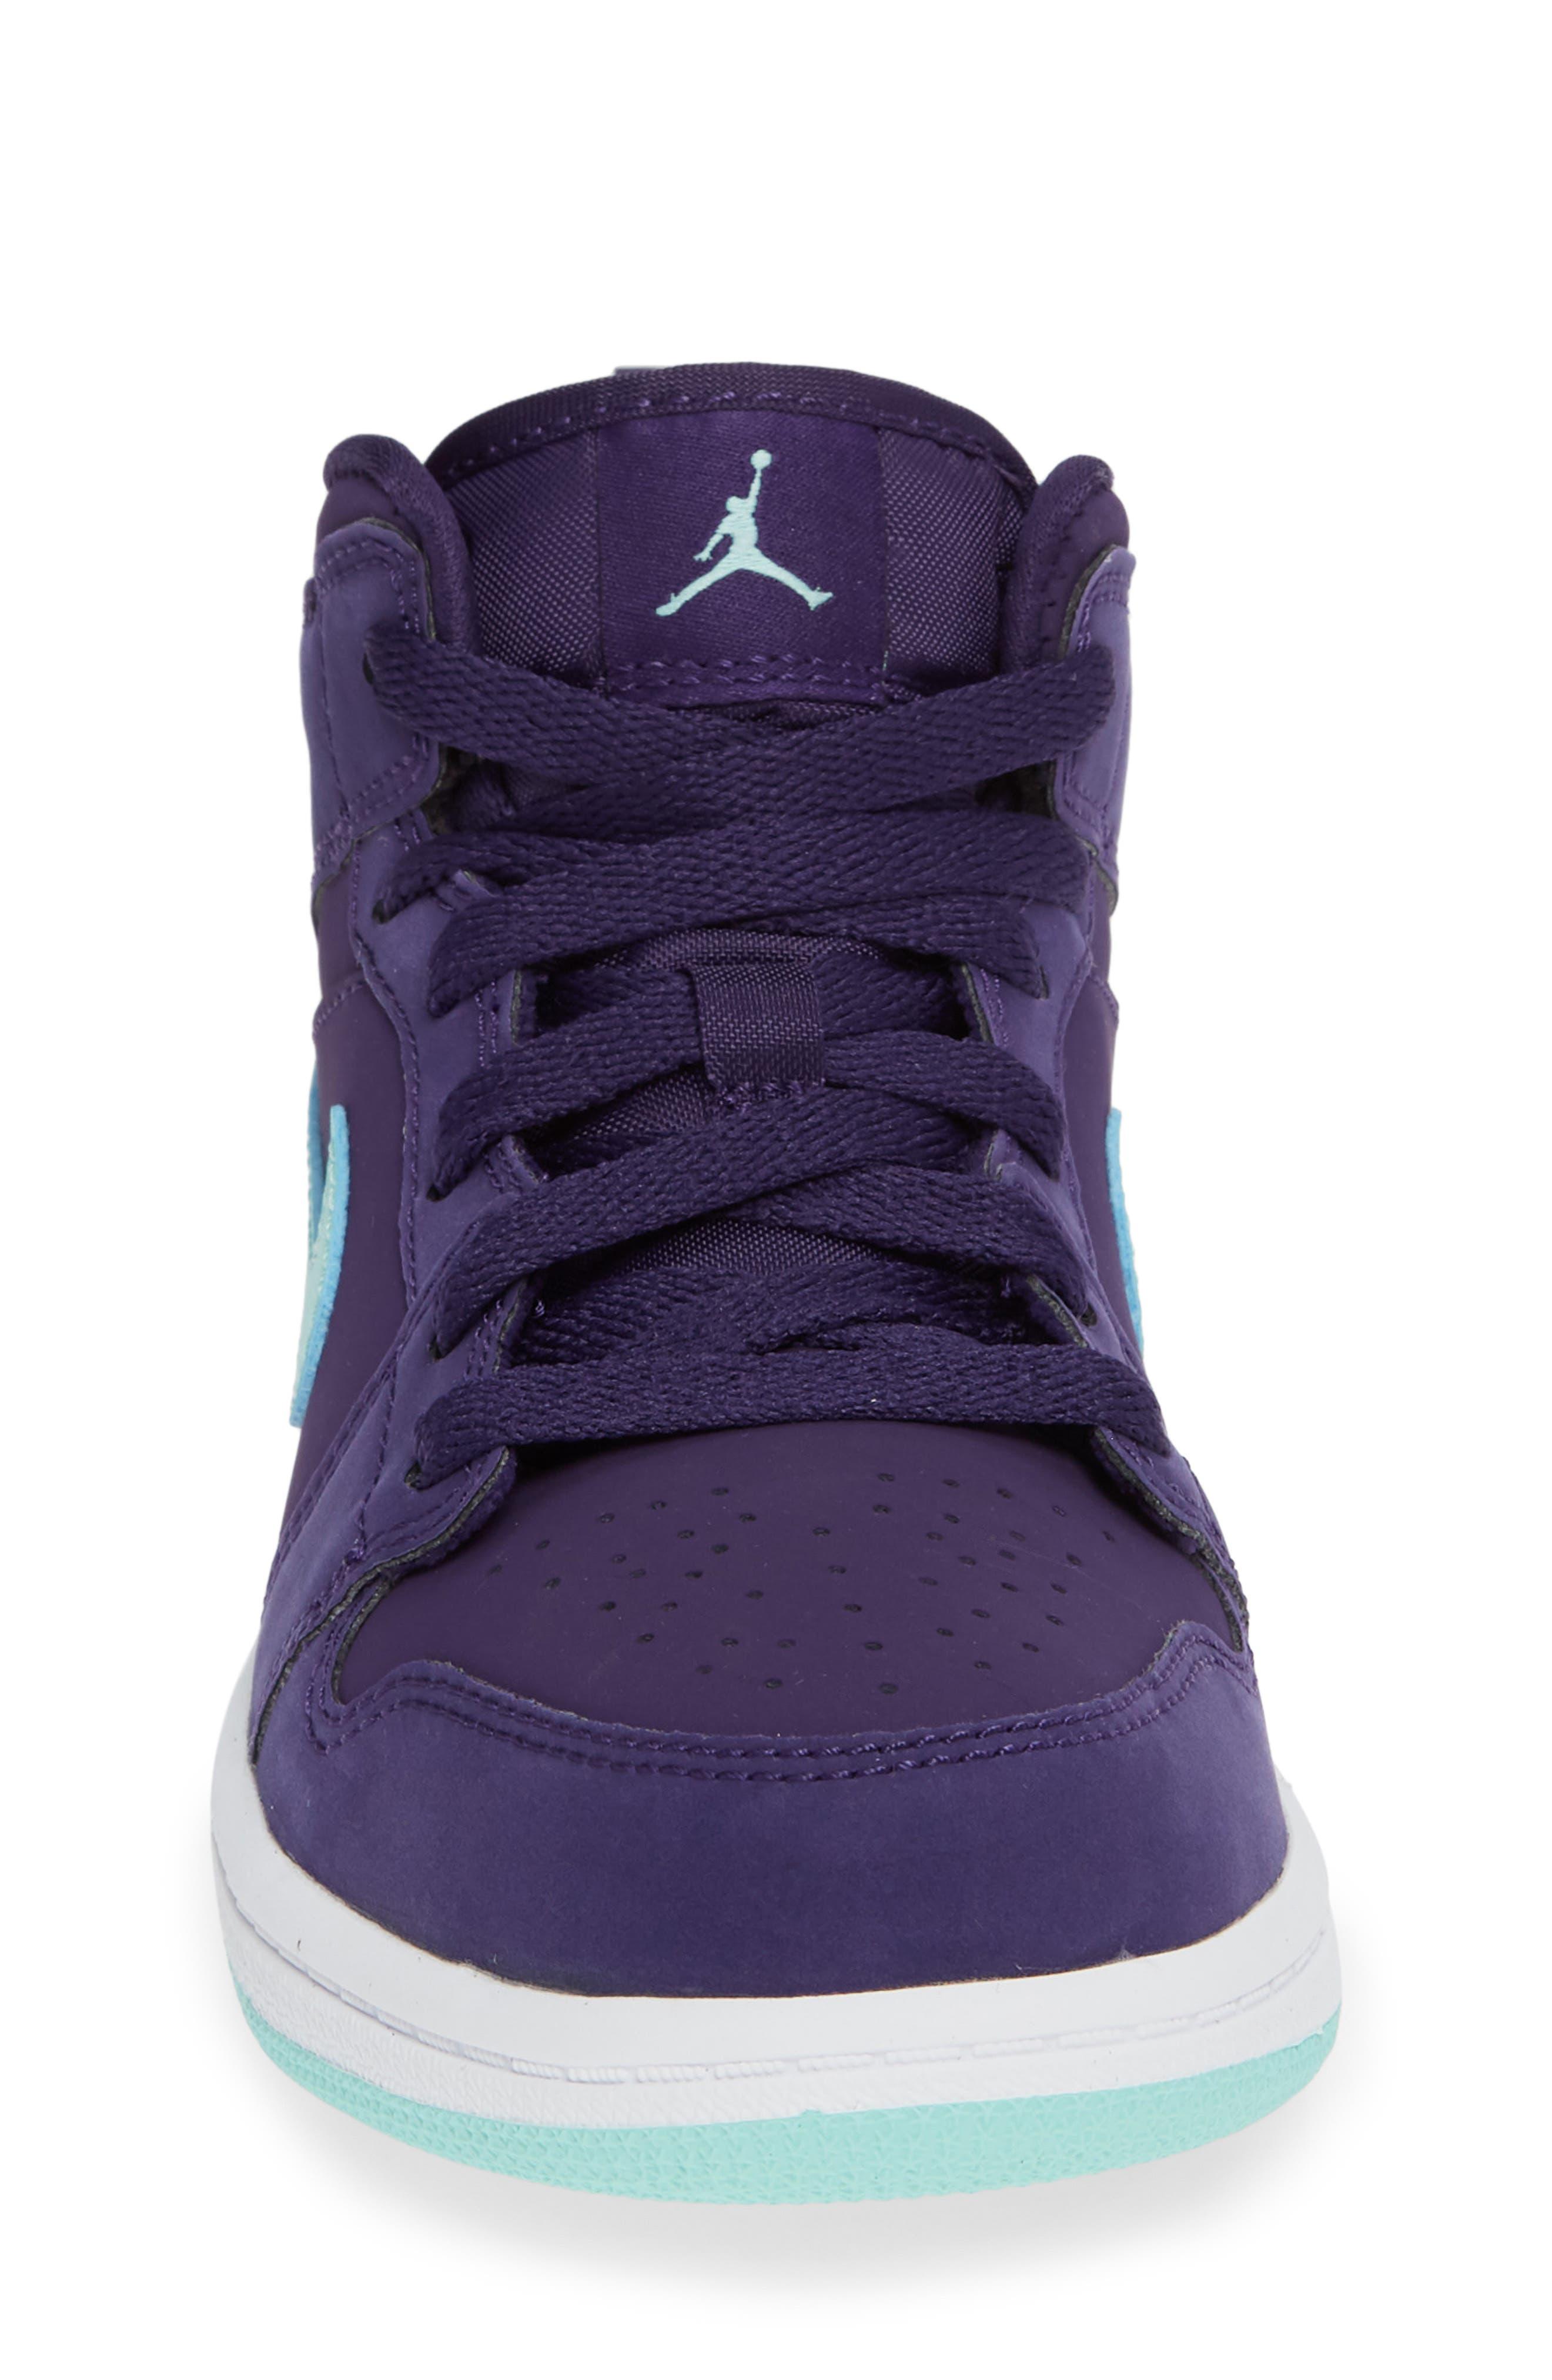 Nike 'Jordan 1 Mid' Basketball Shoe,                             Alternate thumbnail 5, color,                             Ink/ Emerald Rise/ White